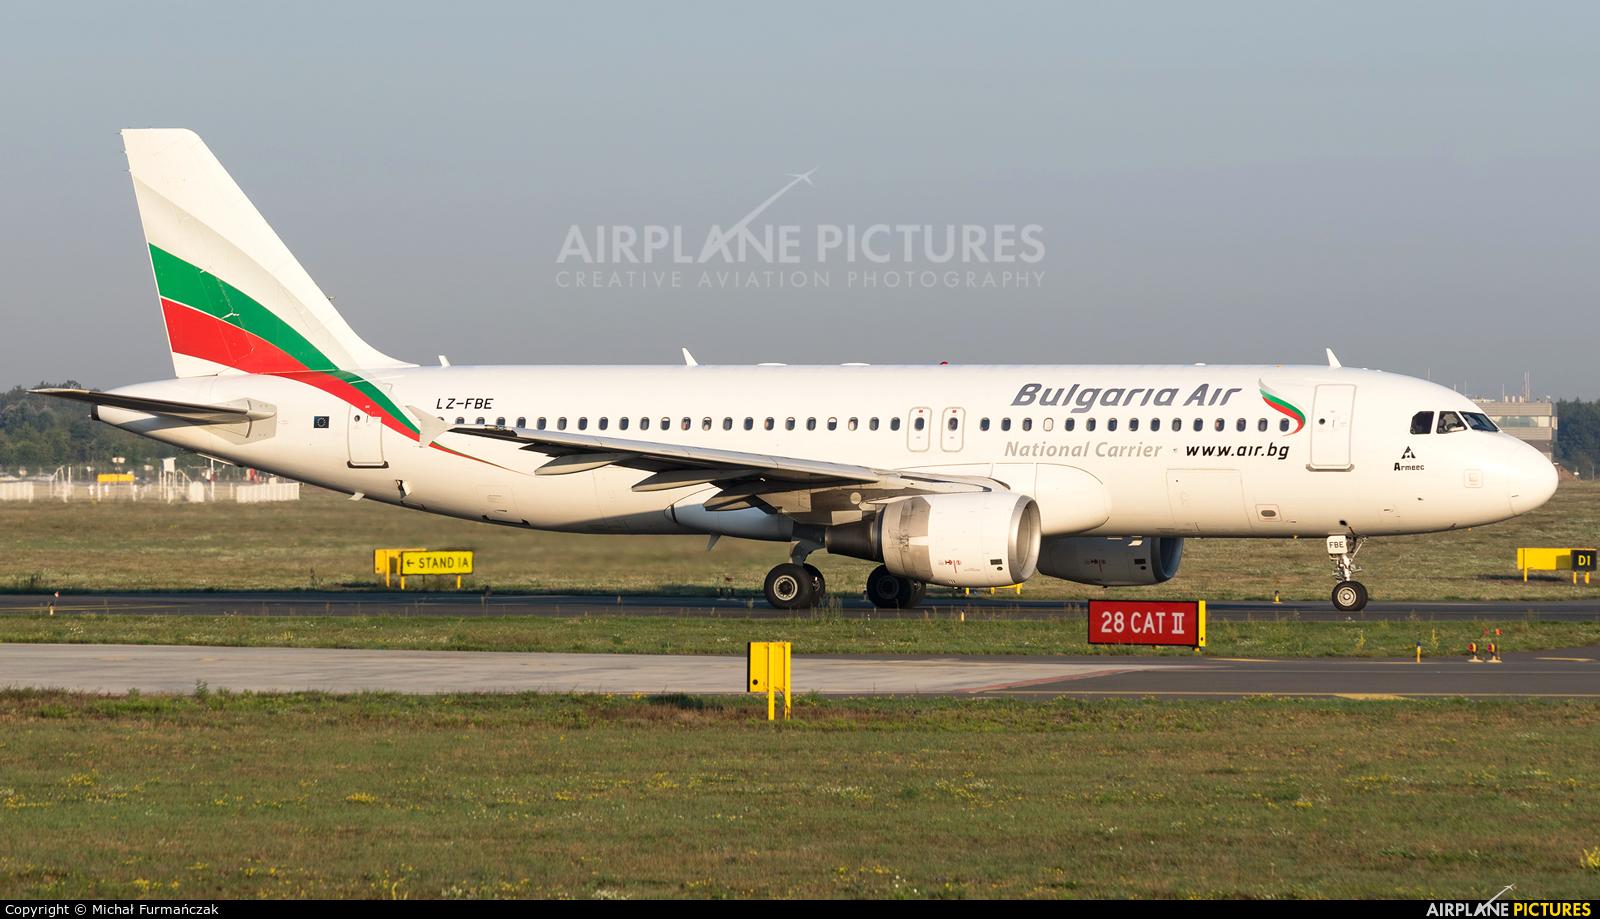 Bulgaria Air LZ-FBE aircraft at Poznań - Ławica